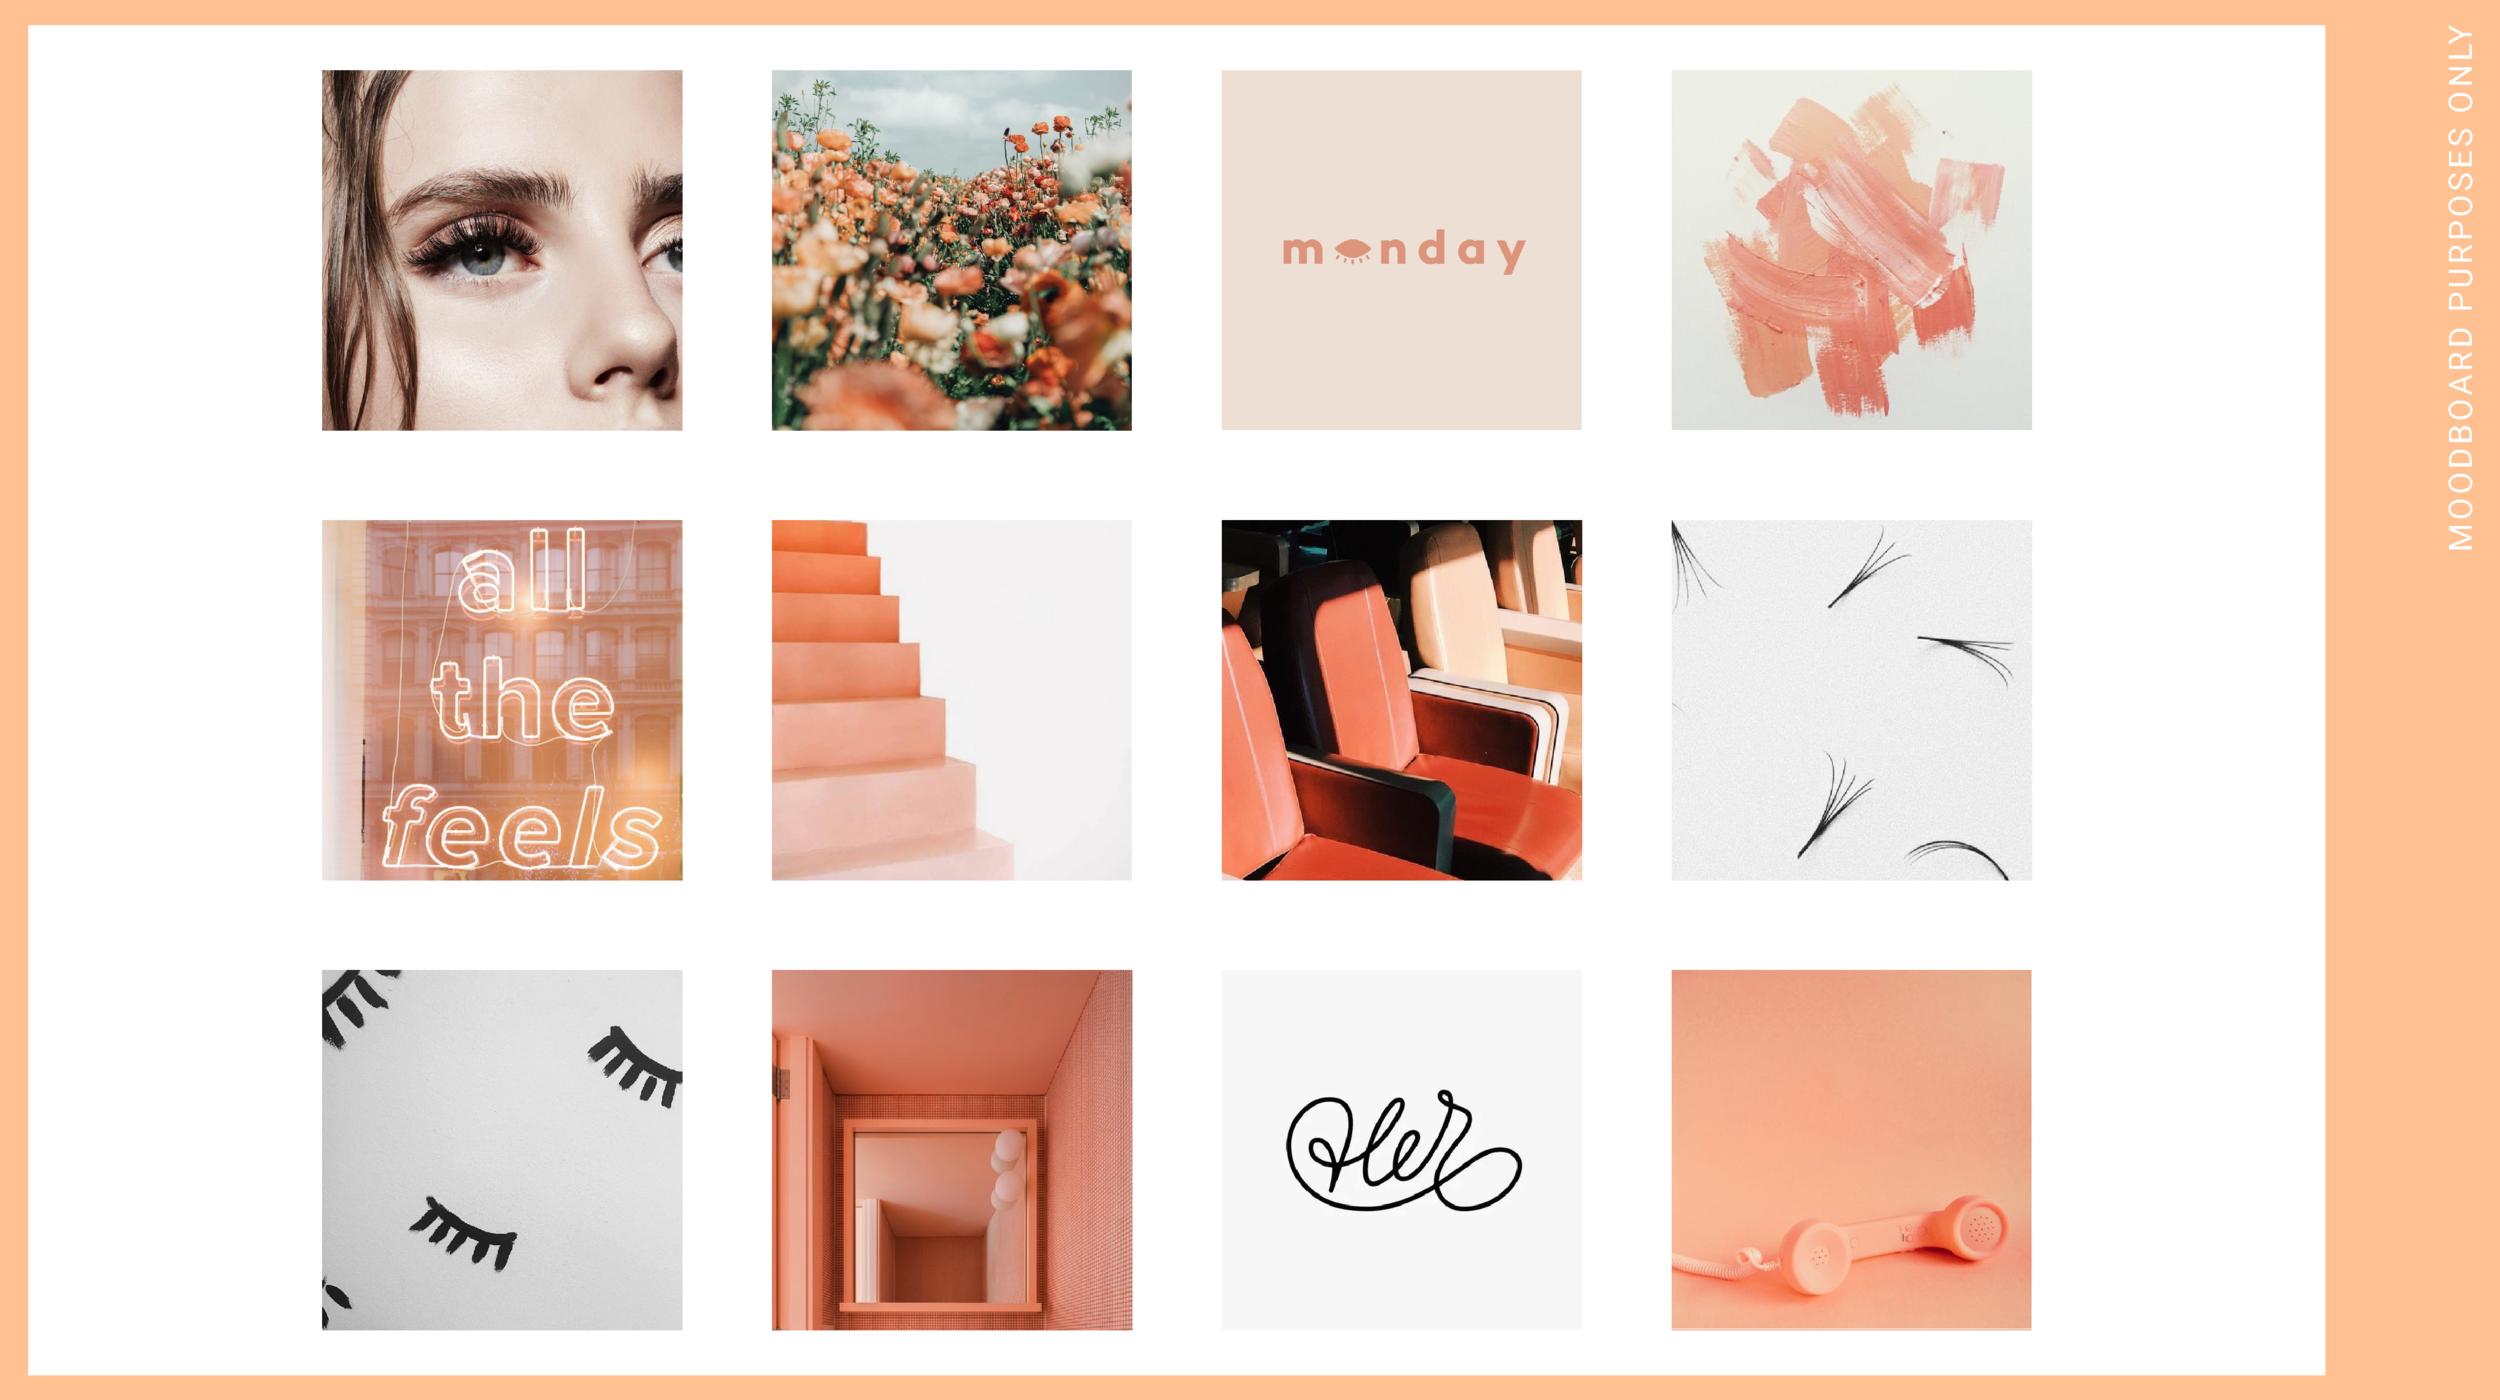 Moodboard Imagery